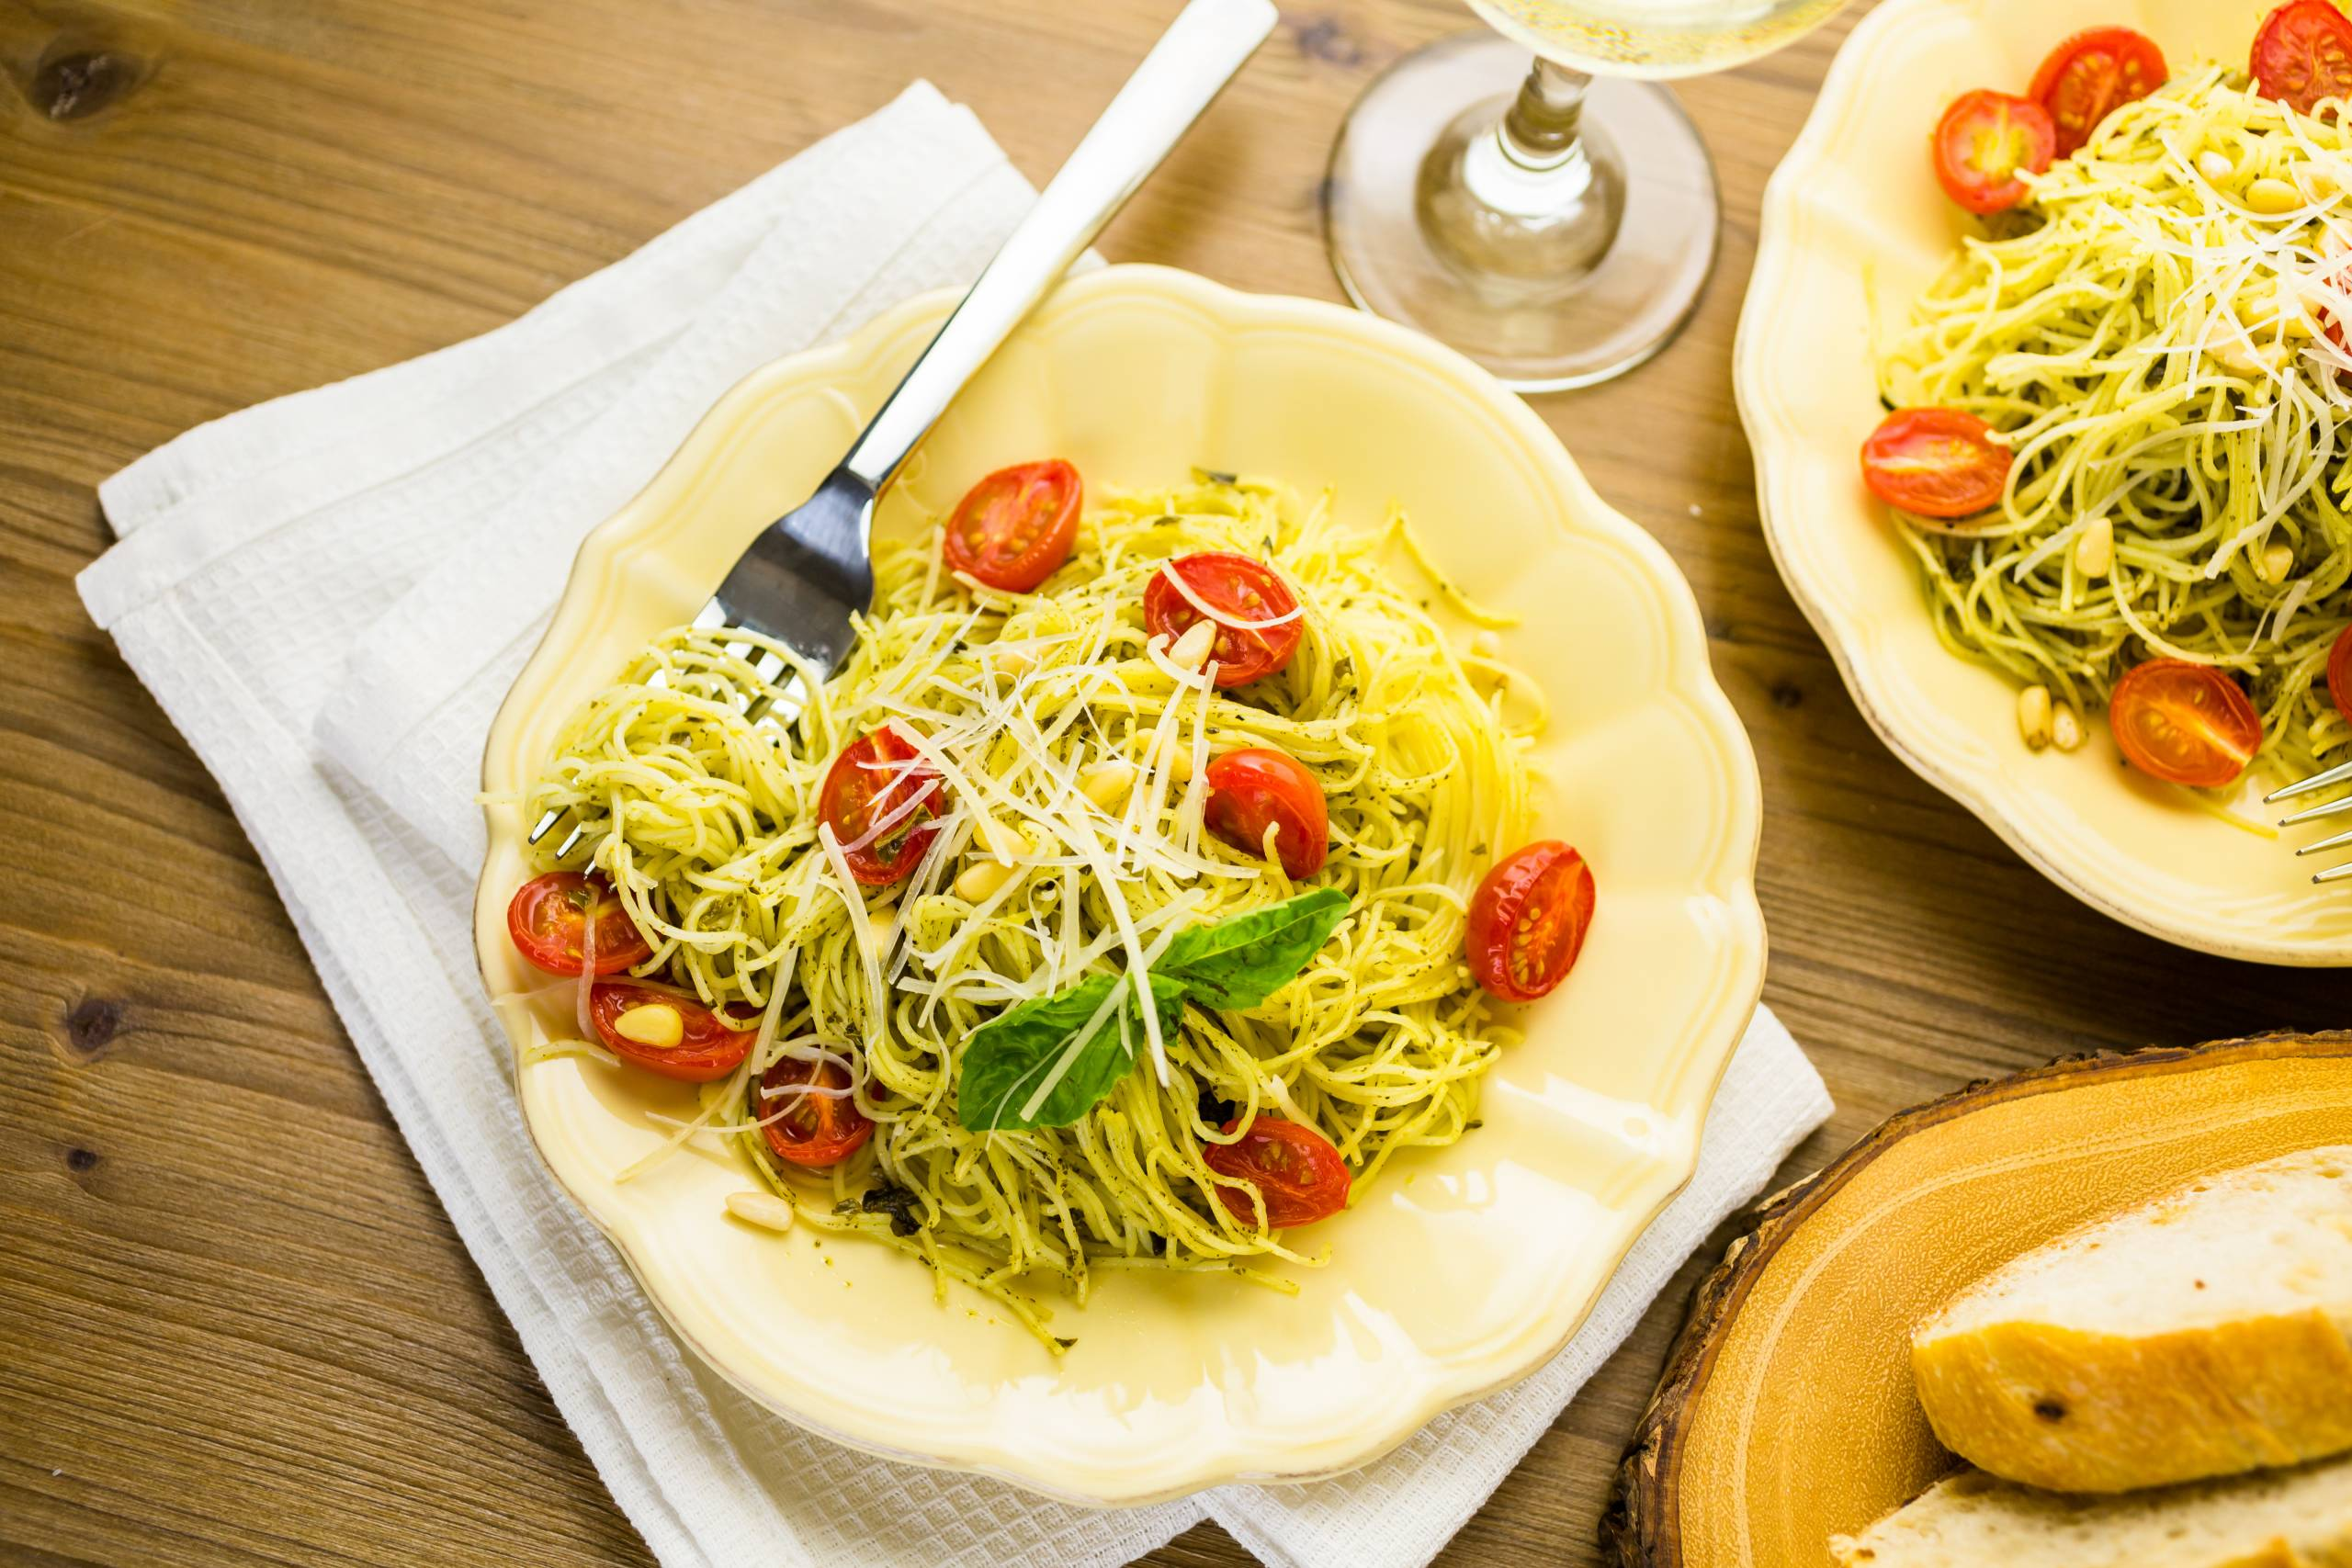 Family friendly meal of angel hair artichoke pasta